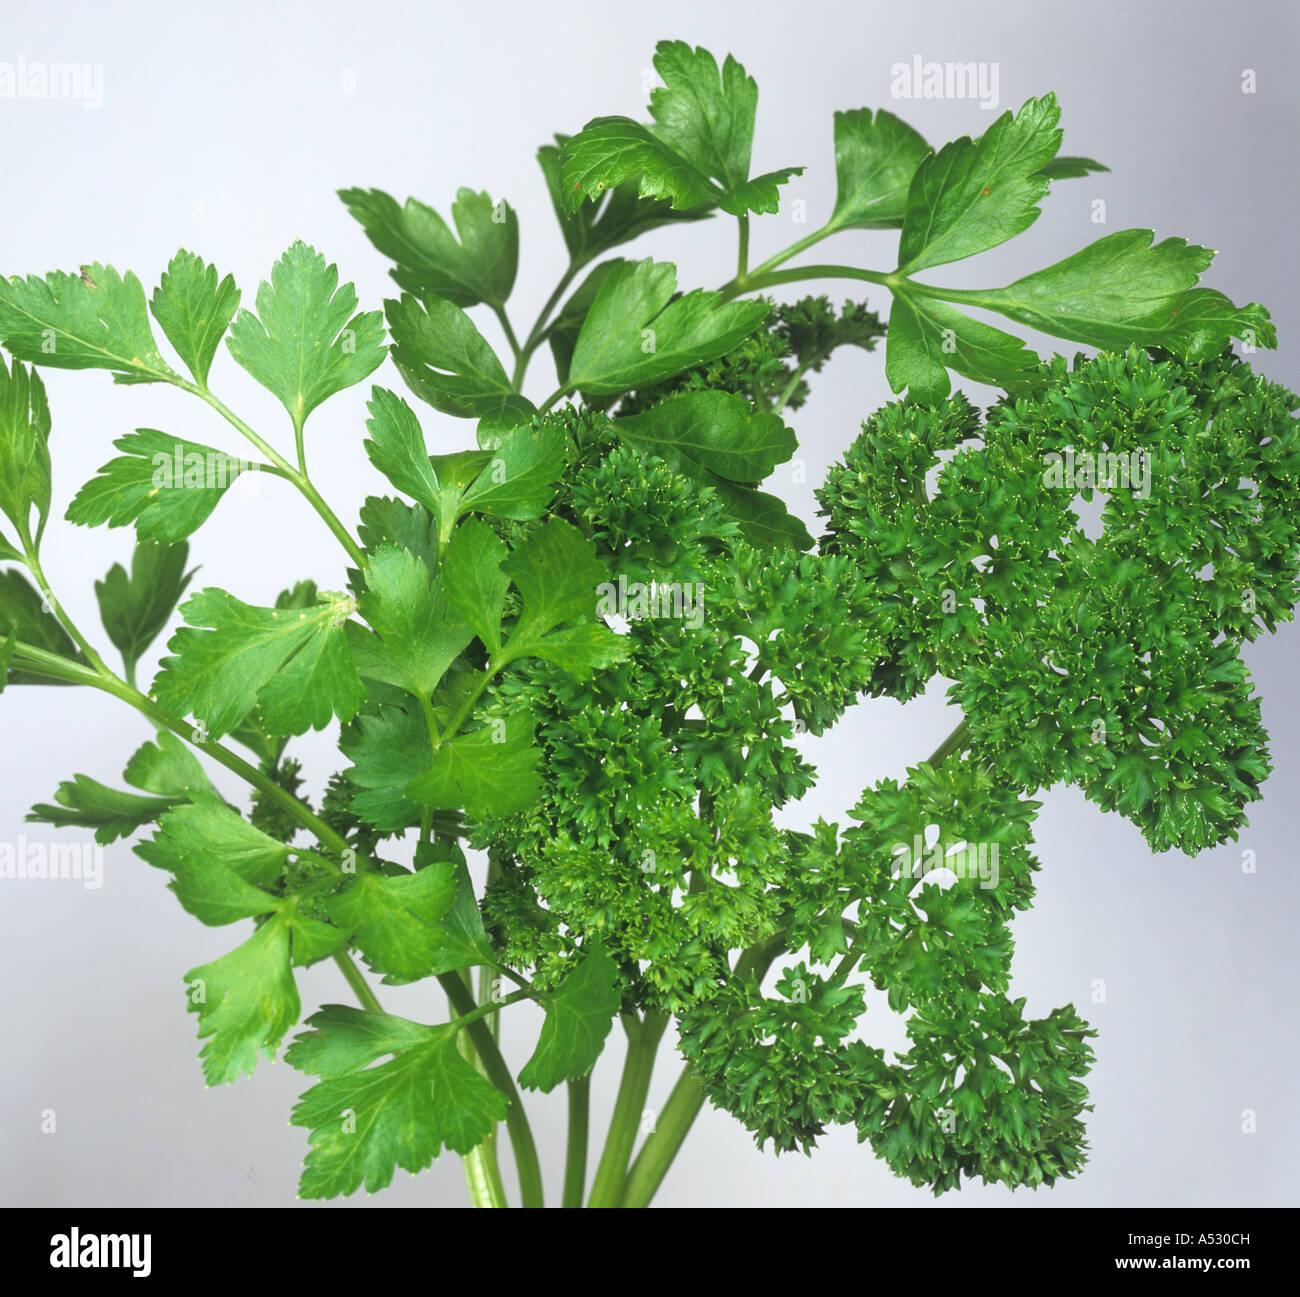 Continental or flat leaved Italian curled parsley leaves Petroselinum crispum - Stock Image